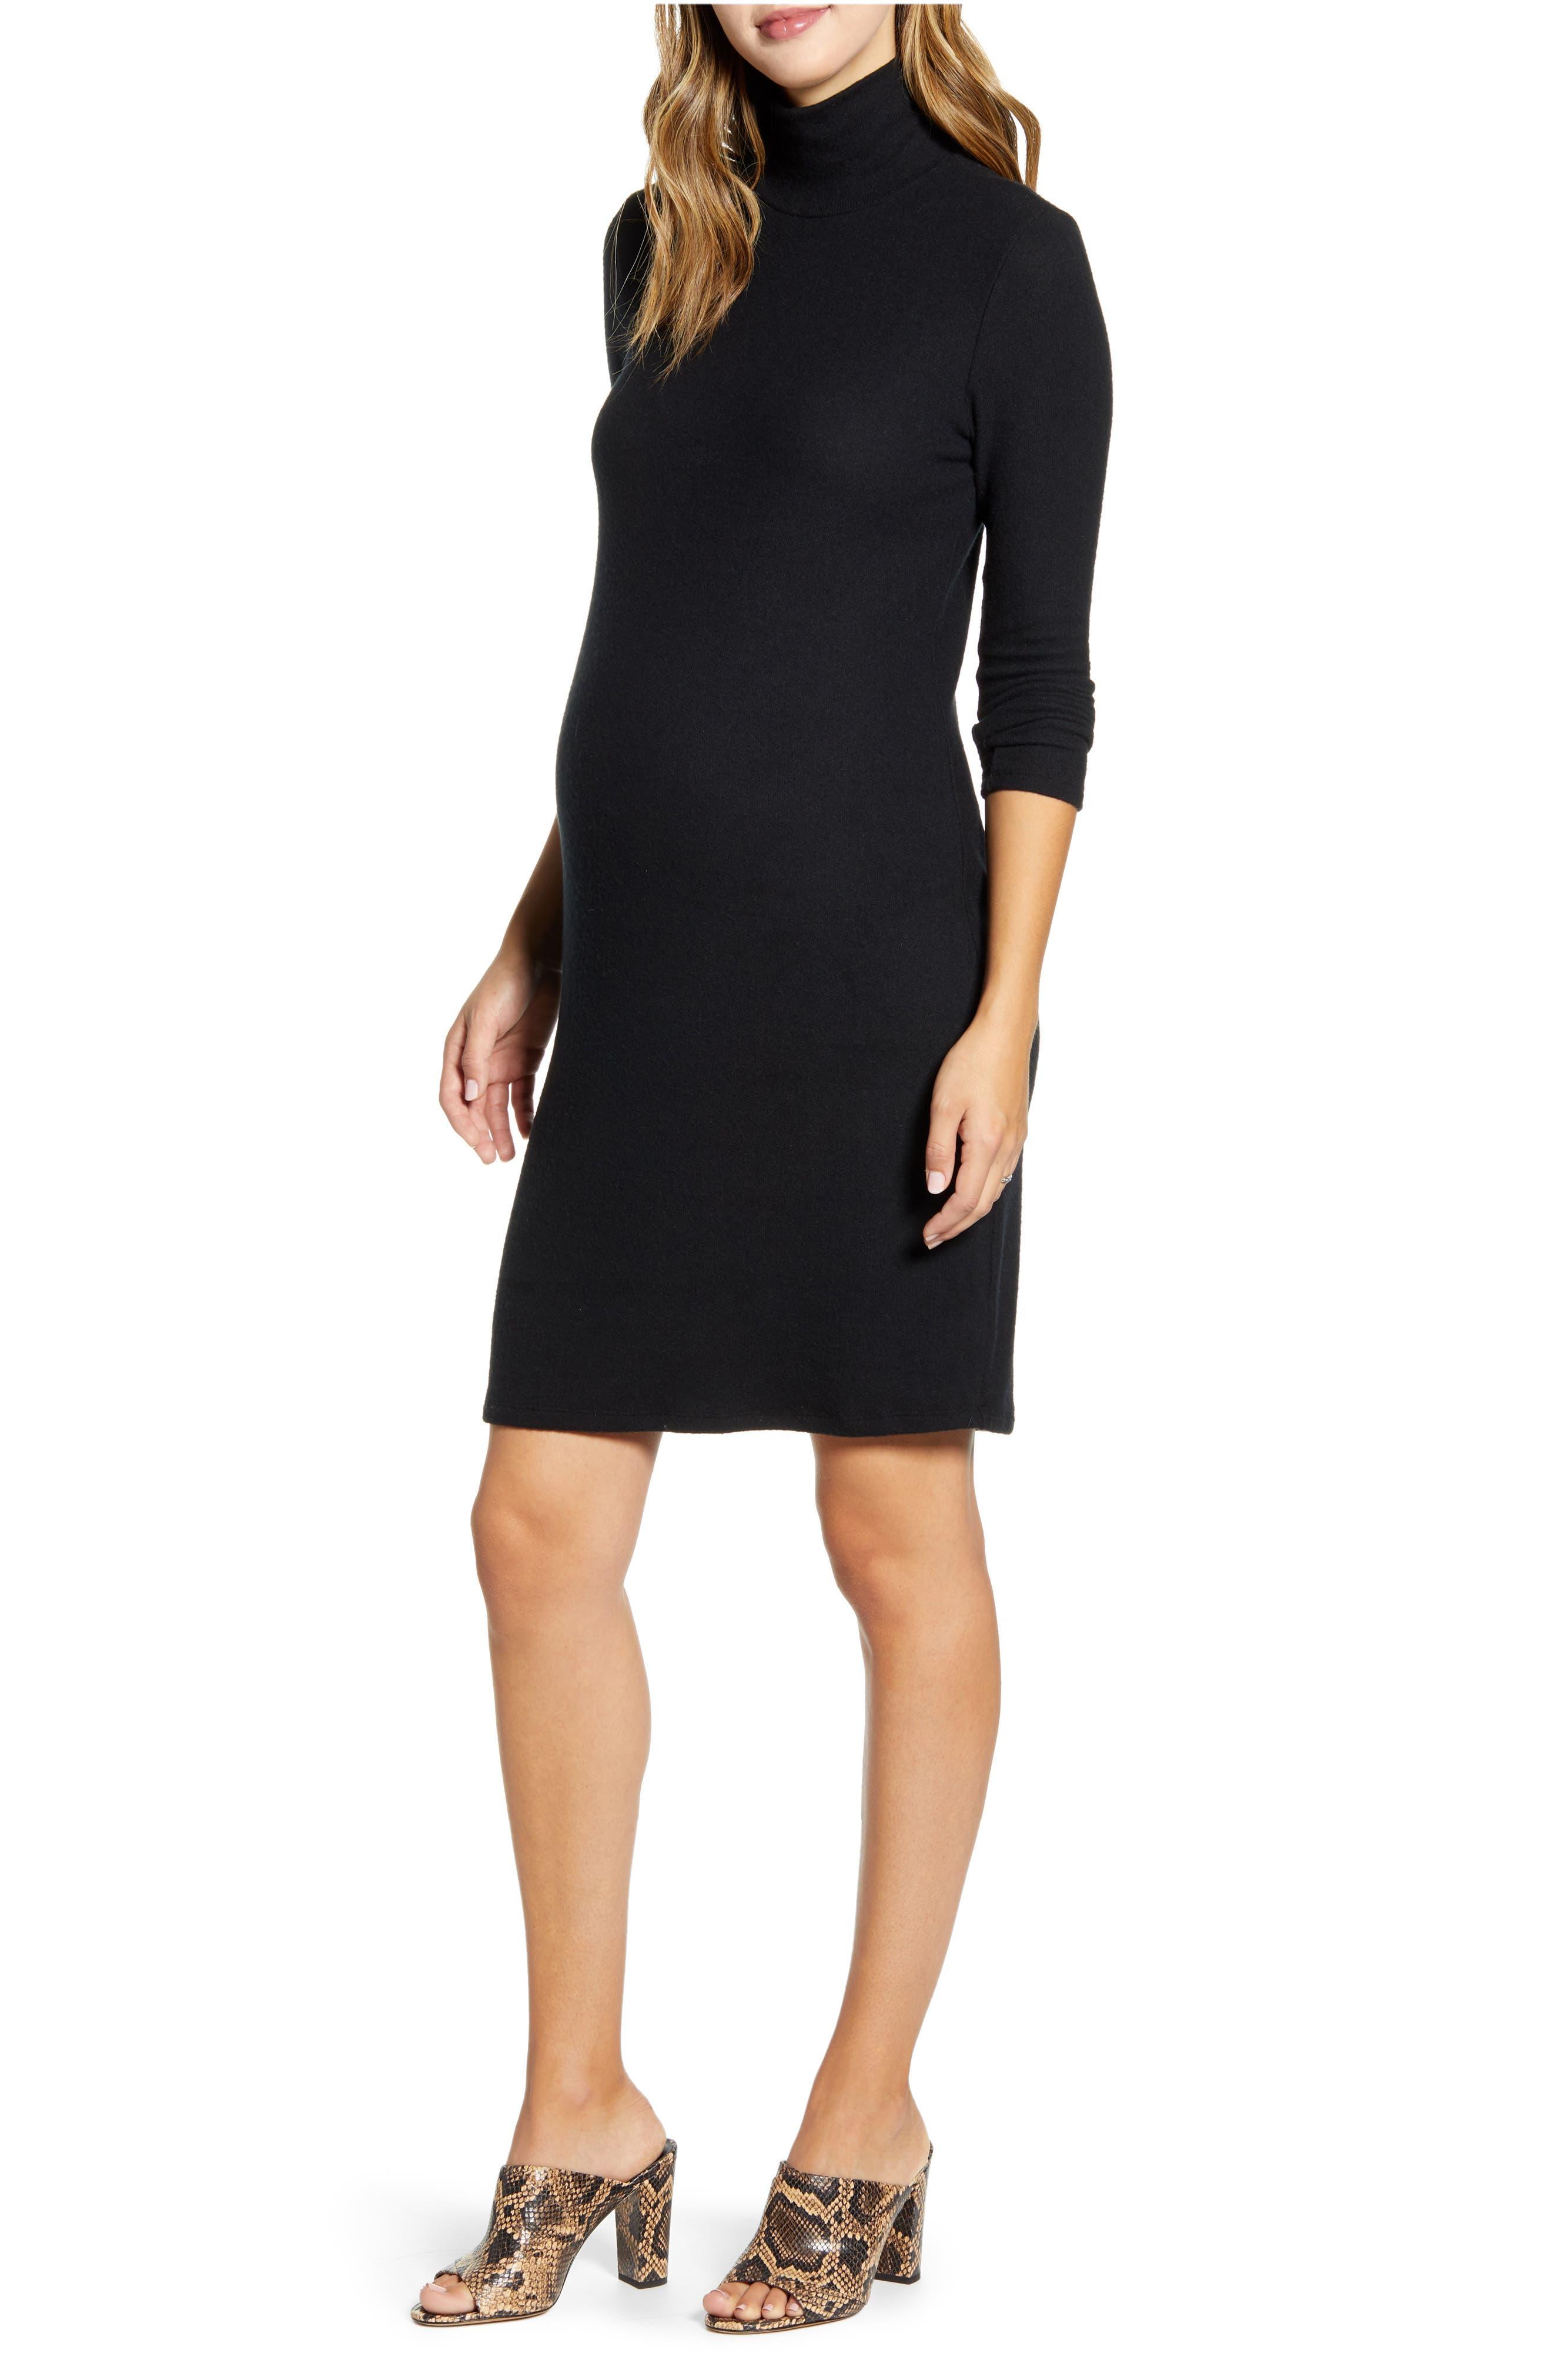 Long Sleeve Turtleneck Maternity Sweater Dress